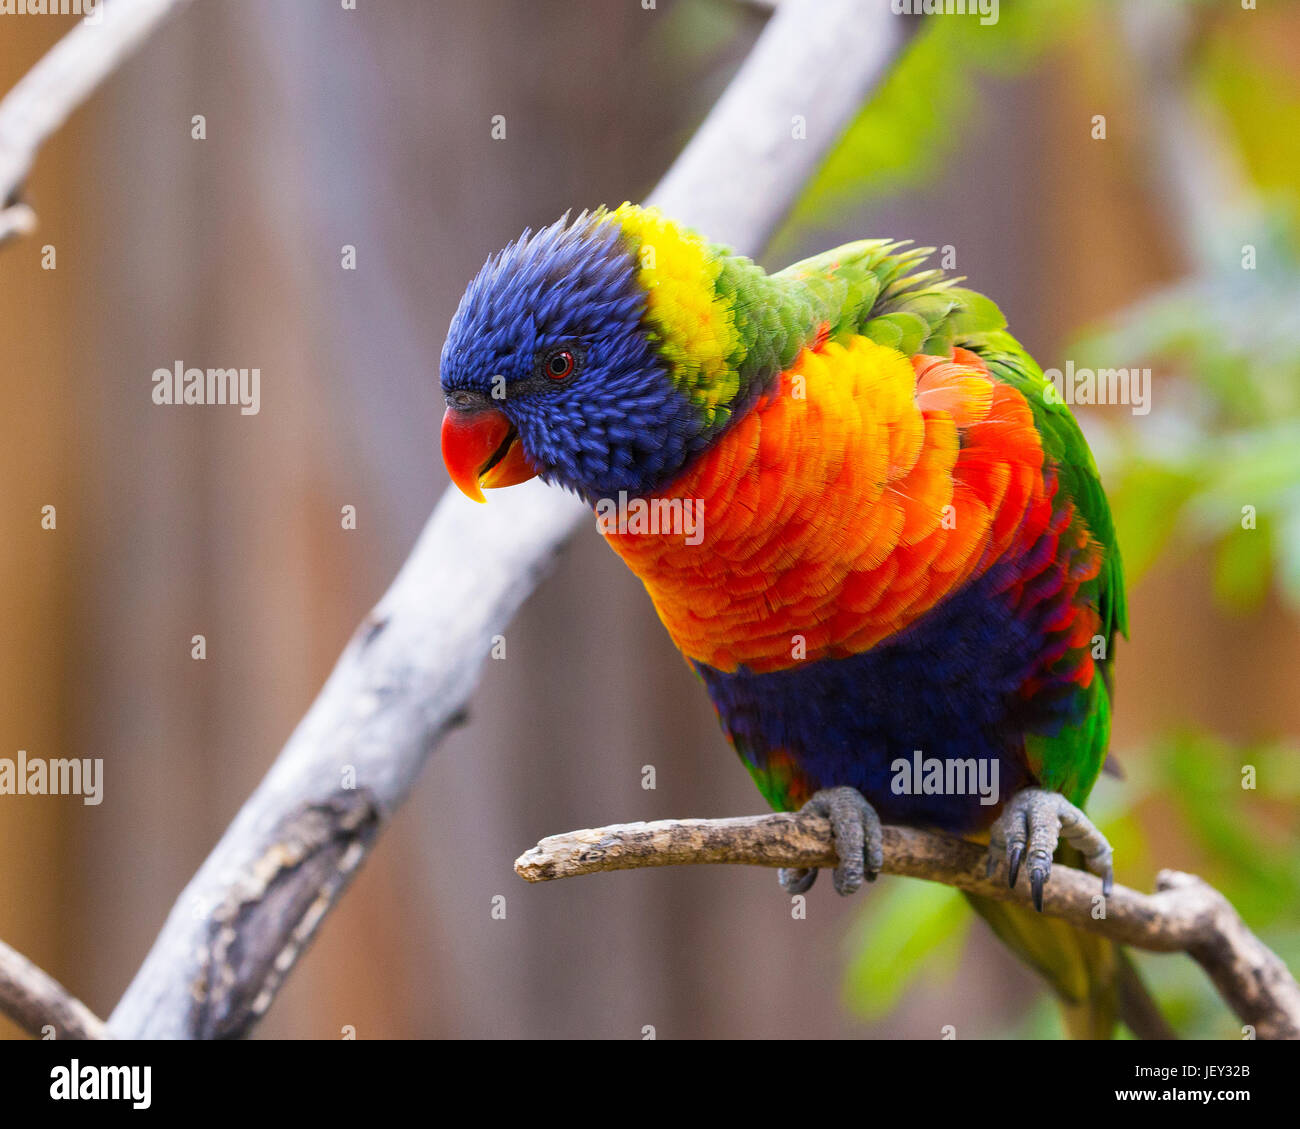 Portrait of Parrot - Rainbow Lorikeet - Stock Image